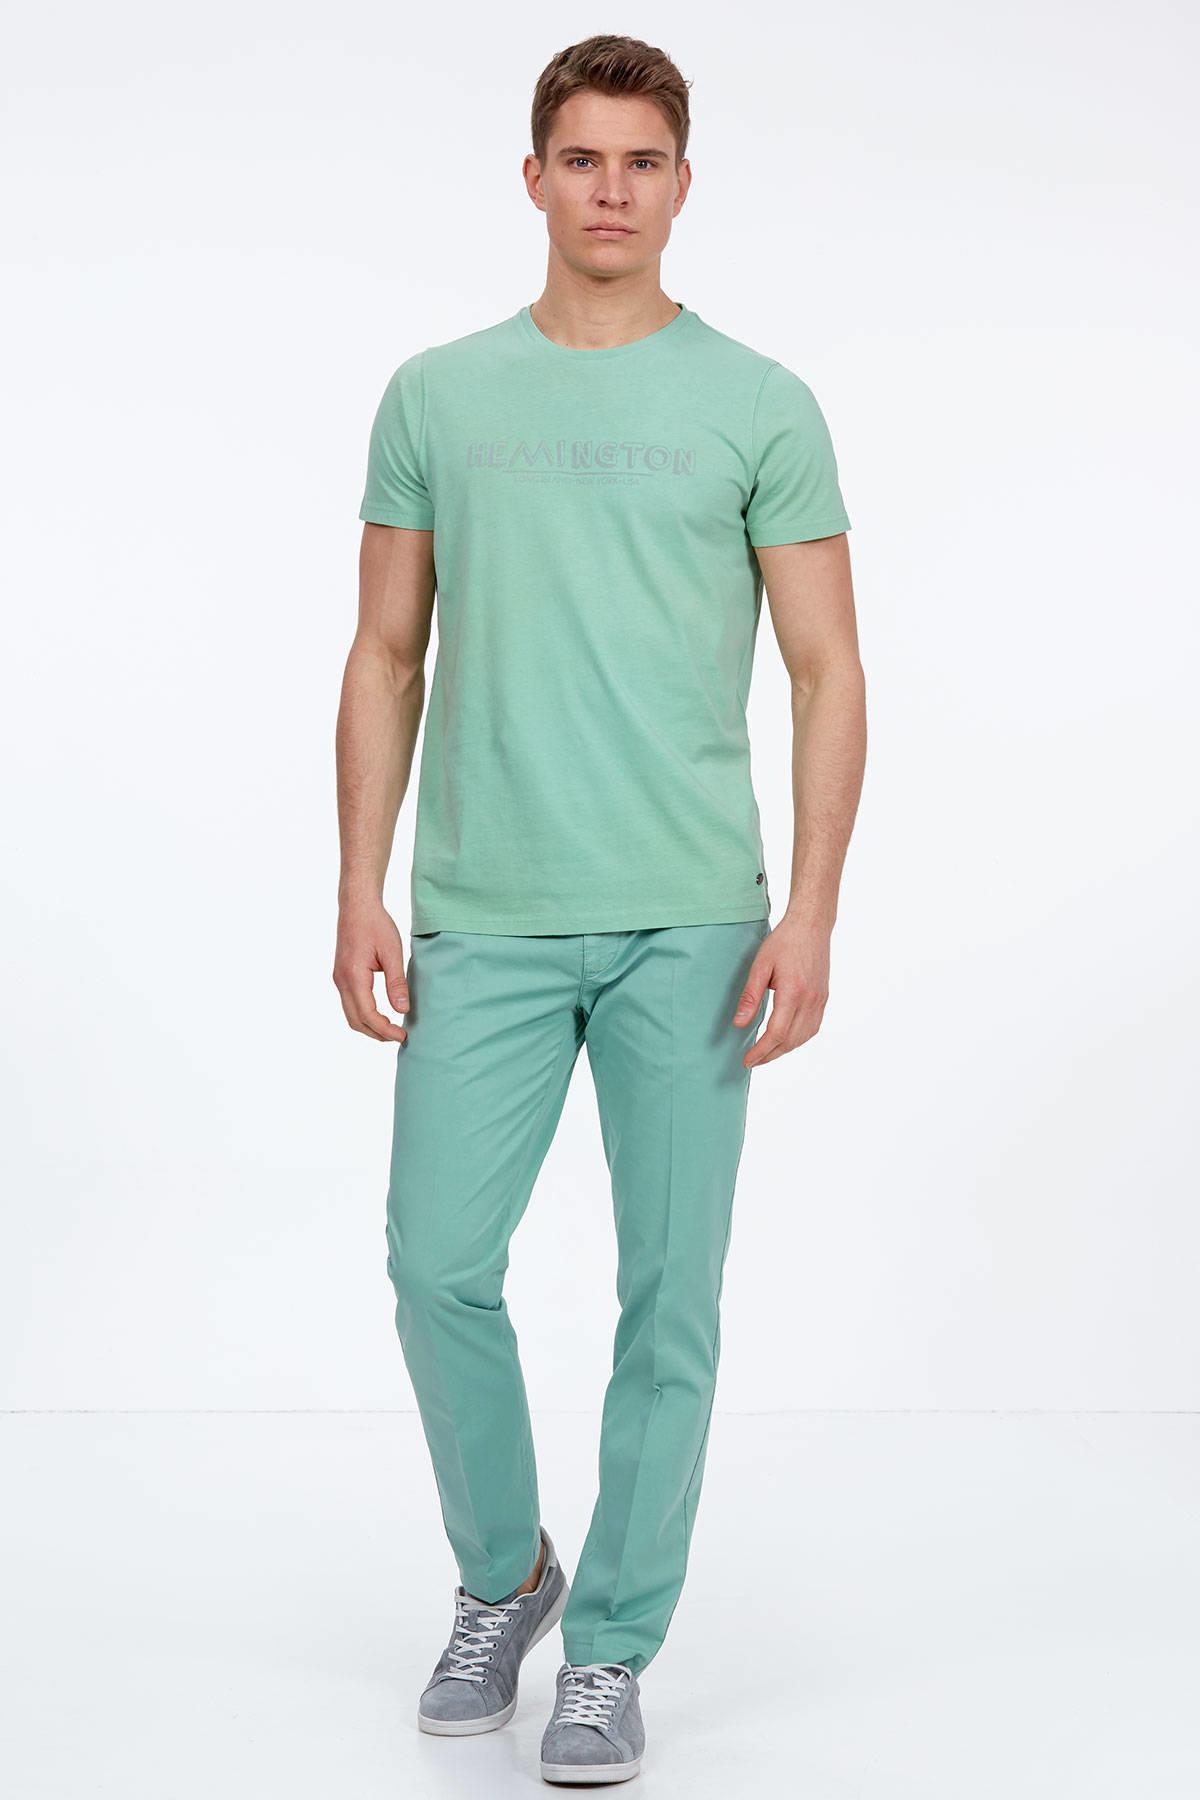 Açık Yeşil Bisiklet Yaka T-Shirt